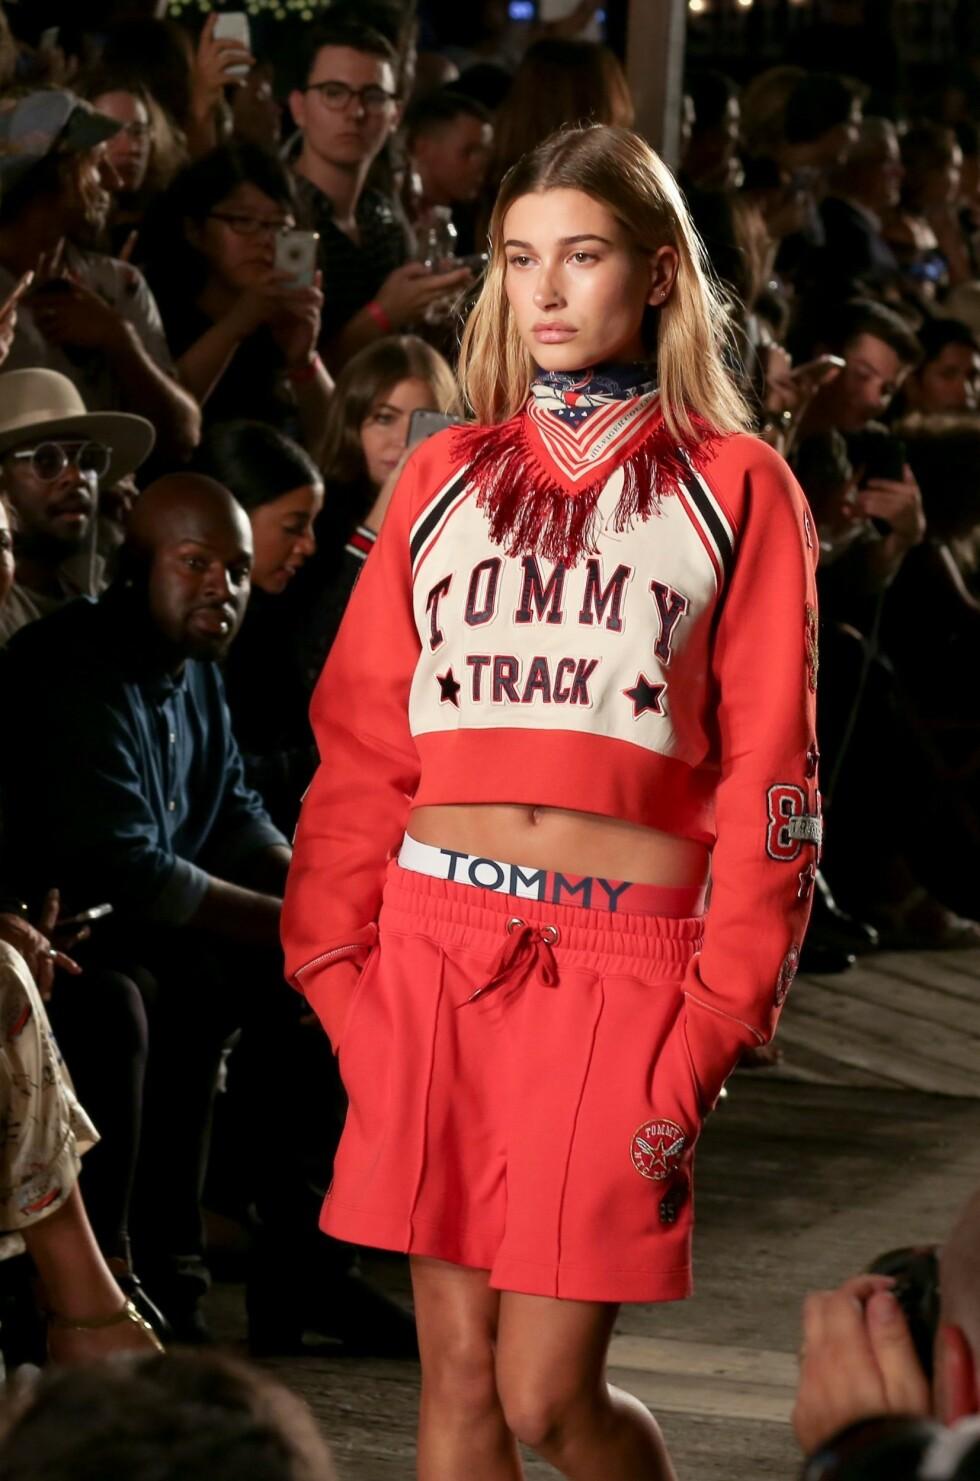 Tommy Hilfiger New York Fashion Week Foto: Rex Features